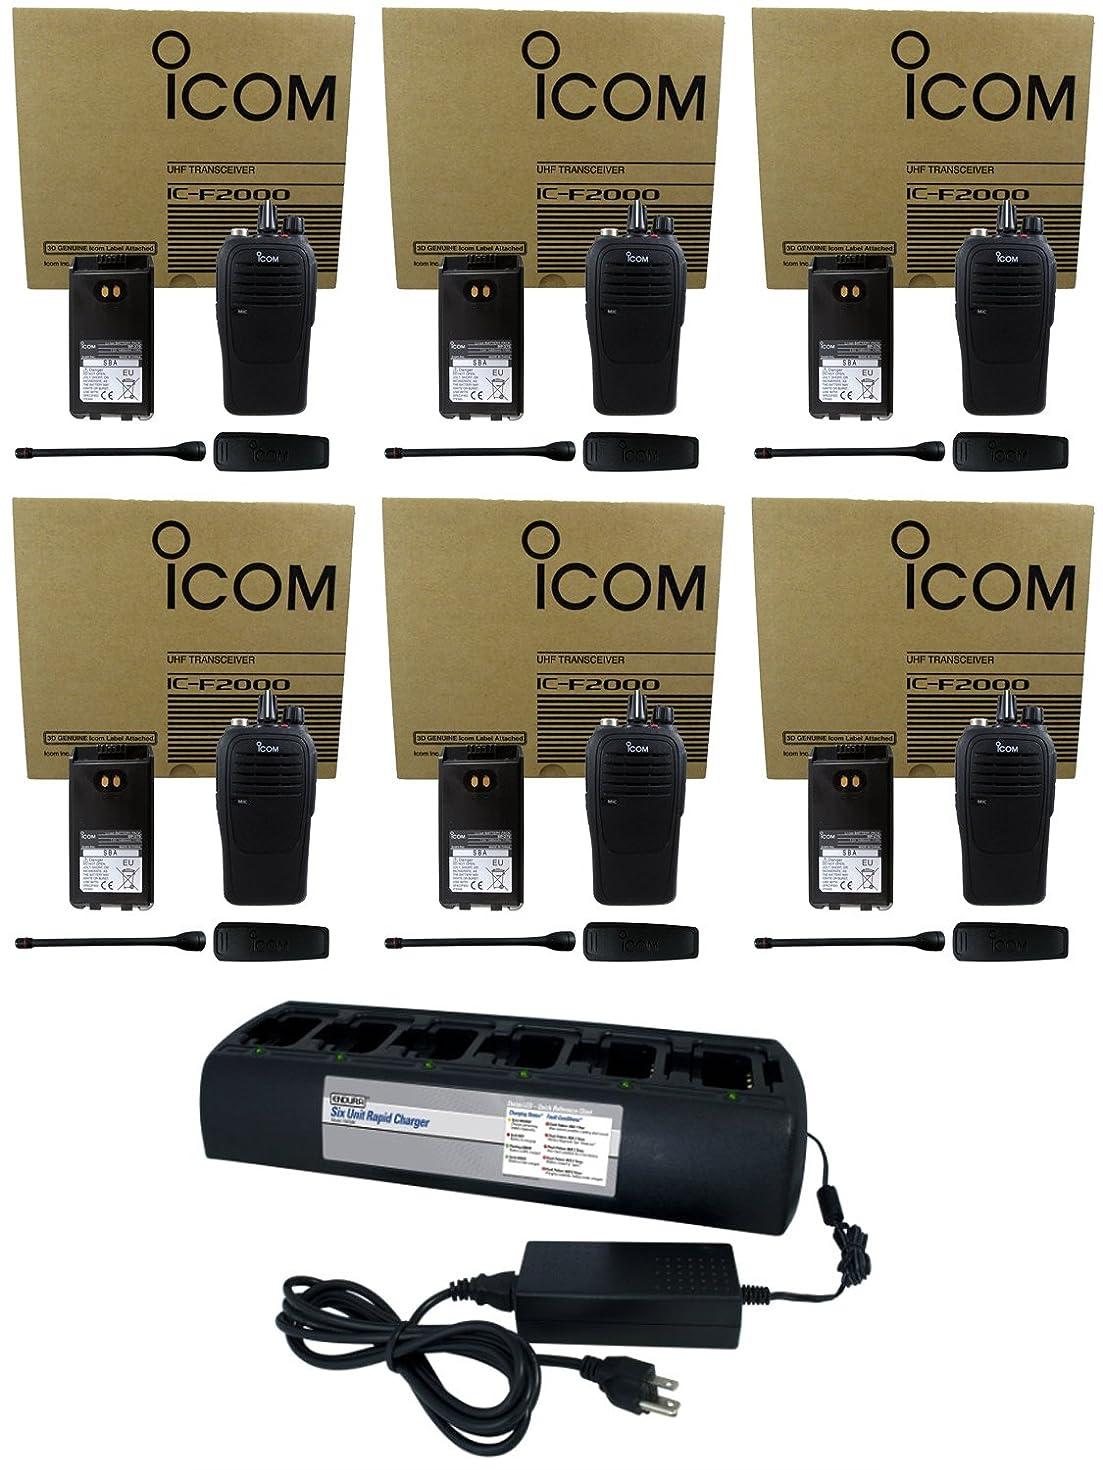 QTY 6 Icom F2000 01 UHF 4 Watt 16 Channel 400-470 MHz Two Way Radio with QTY 1 Power Products TWC6M 6 Unit Gang Charger